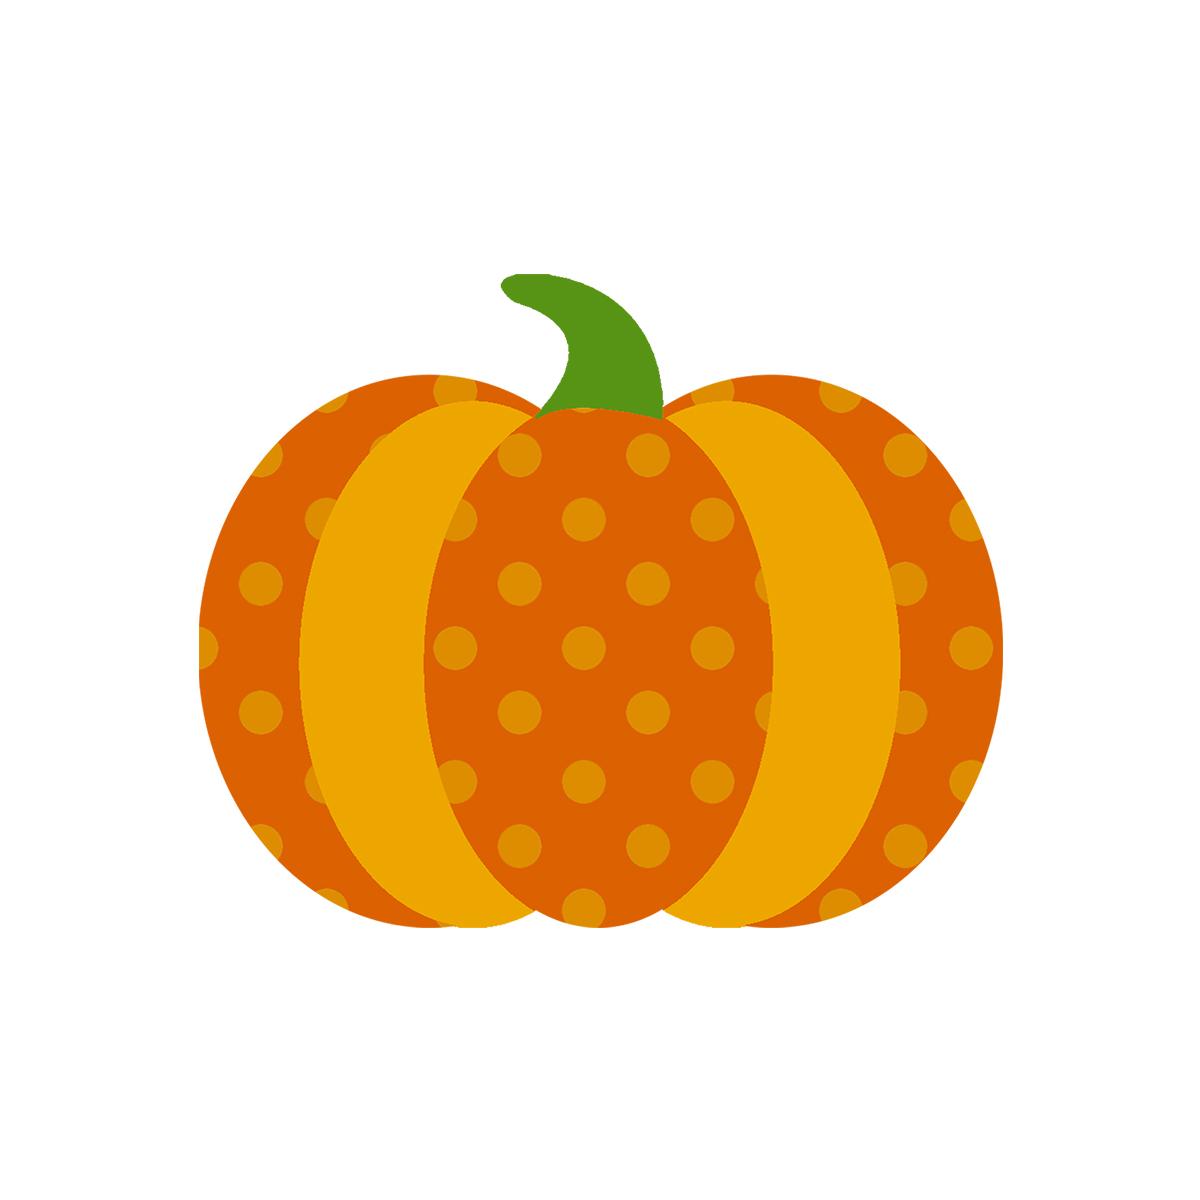 1200x1200 Transparent Pumpkin Clipart